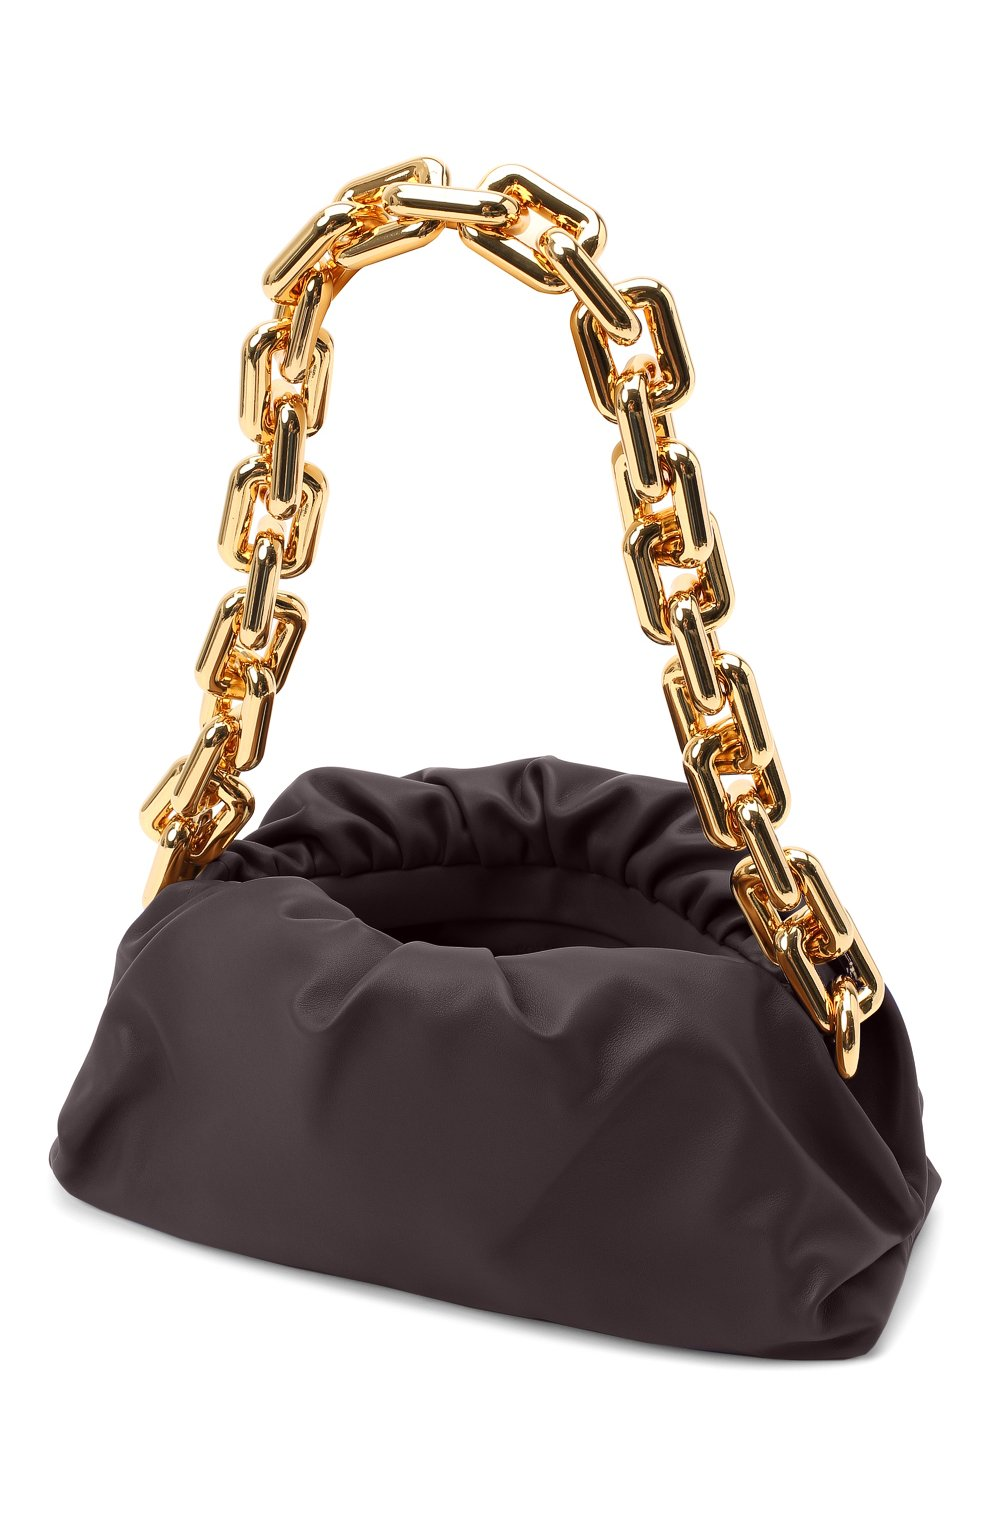 Женская сумка chain pouch BOTTEGA VENETA темно-фиолетового цвета, арт. 620230/VCP40 | Фото 4